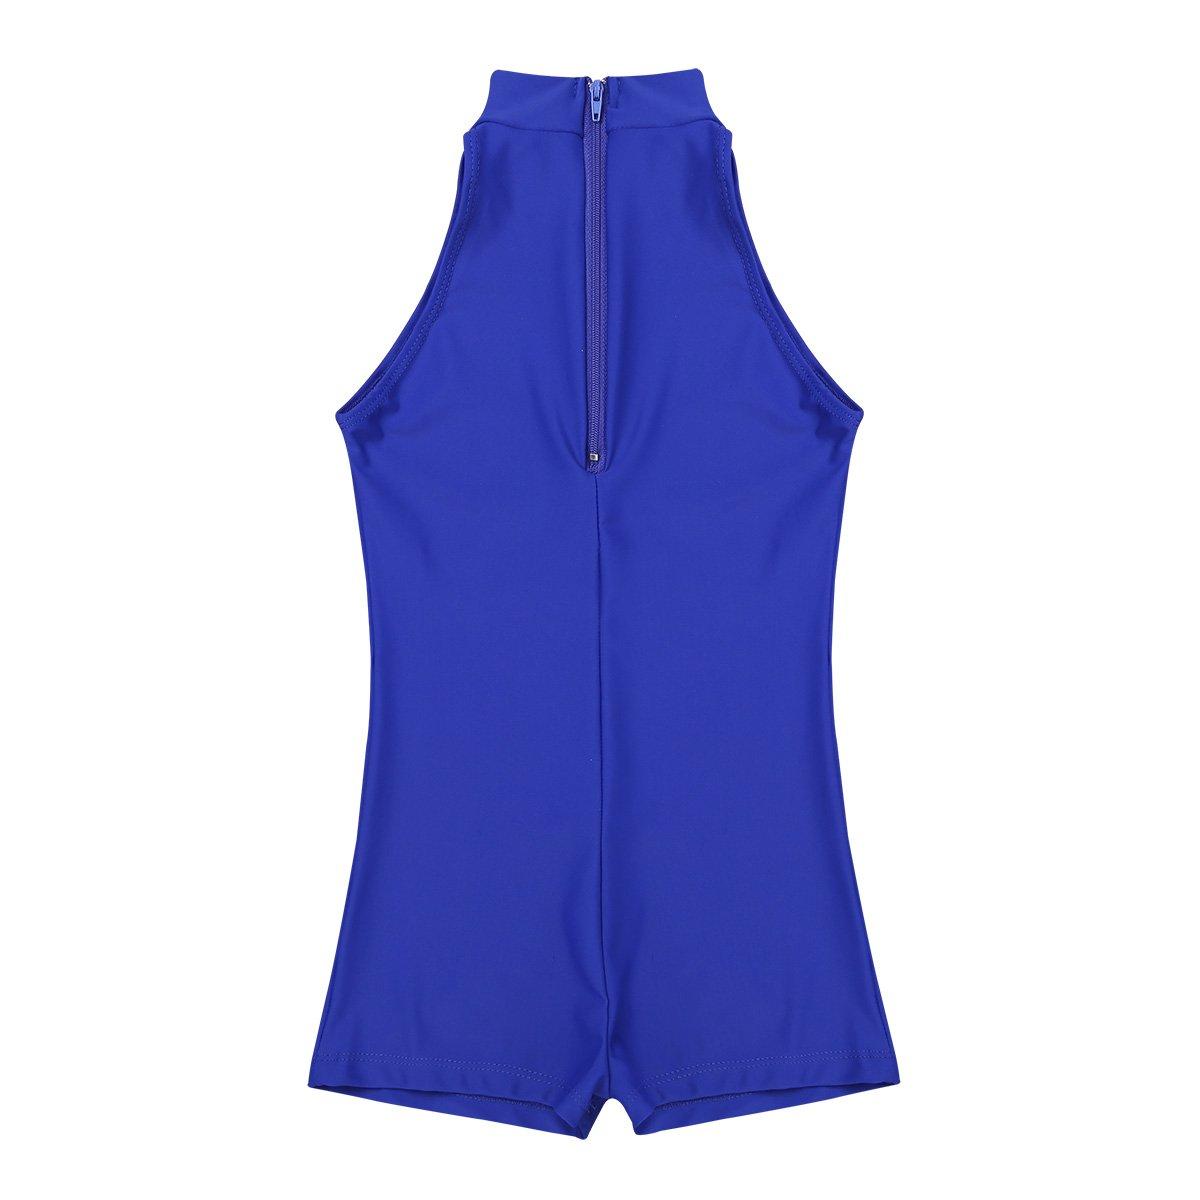 FEESHOW Girls Turtleneck Leotard Zipper Back Gymnastic Ballet Dance Unitard Bodysuit Biketard Athletic Sports Outfit